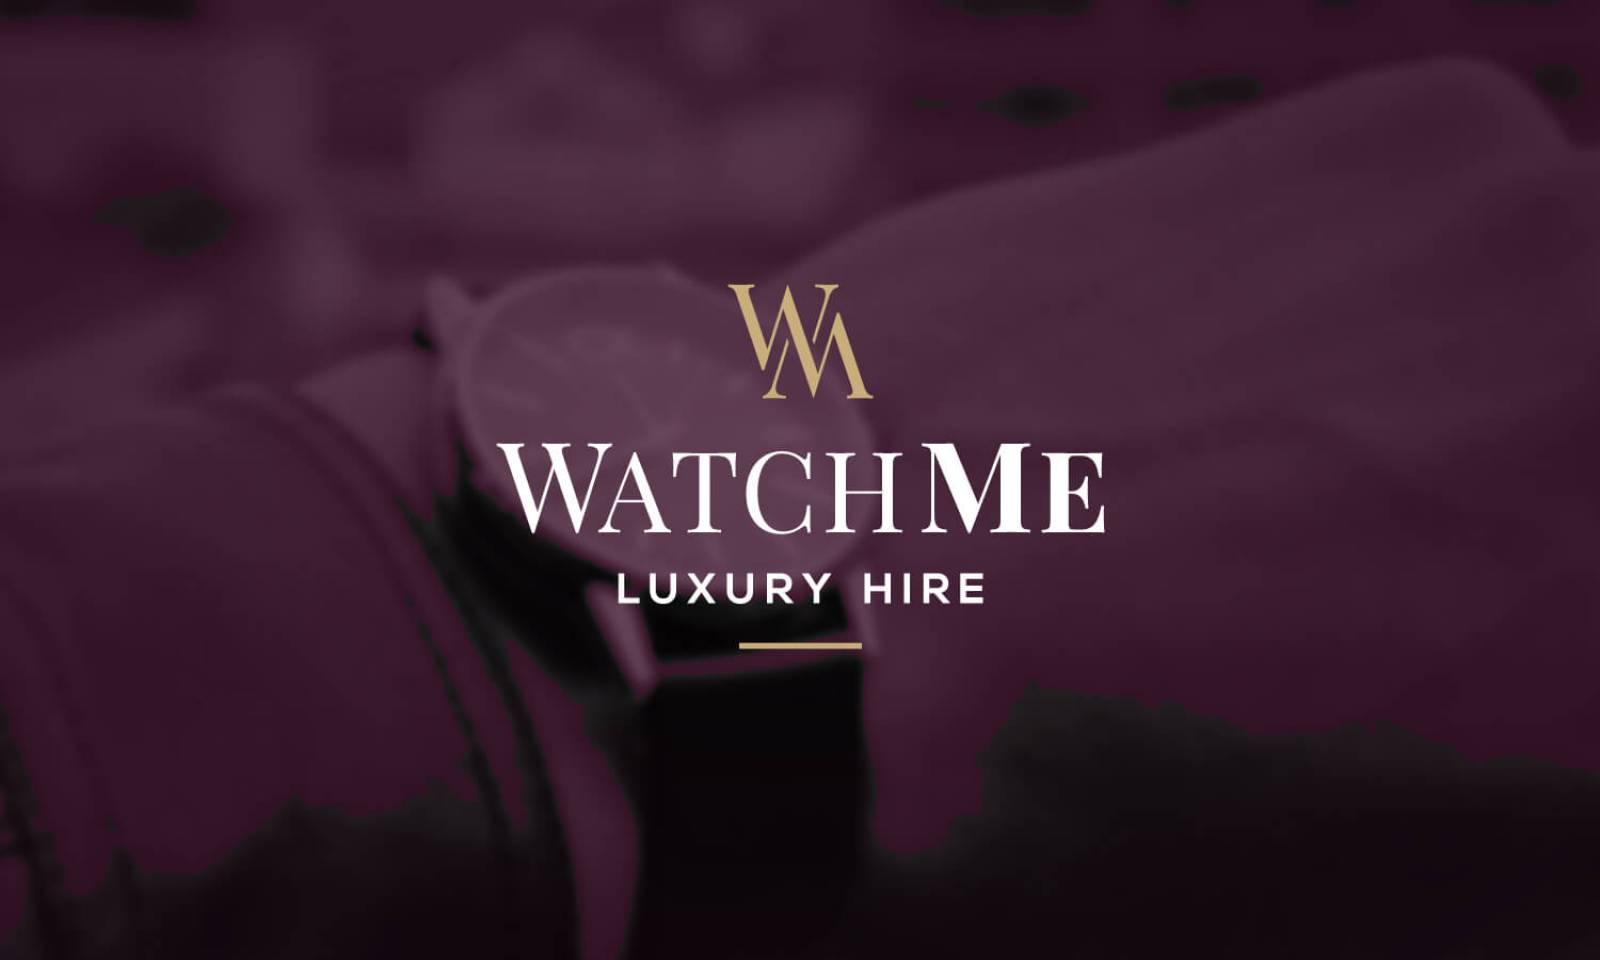 logo-Watchme-3-corporate-identity-agency-graphic-design-canterbury.jpg